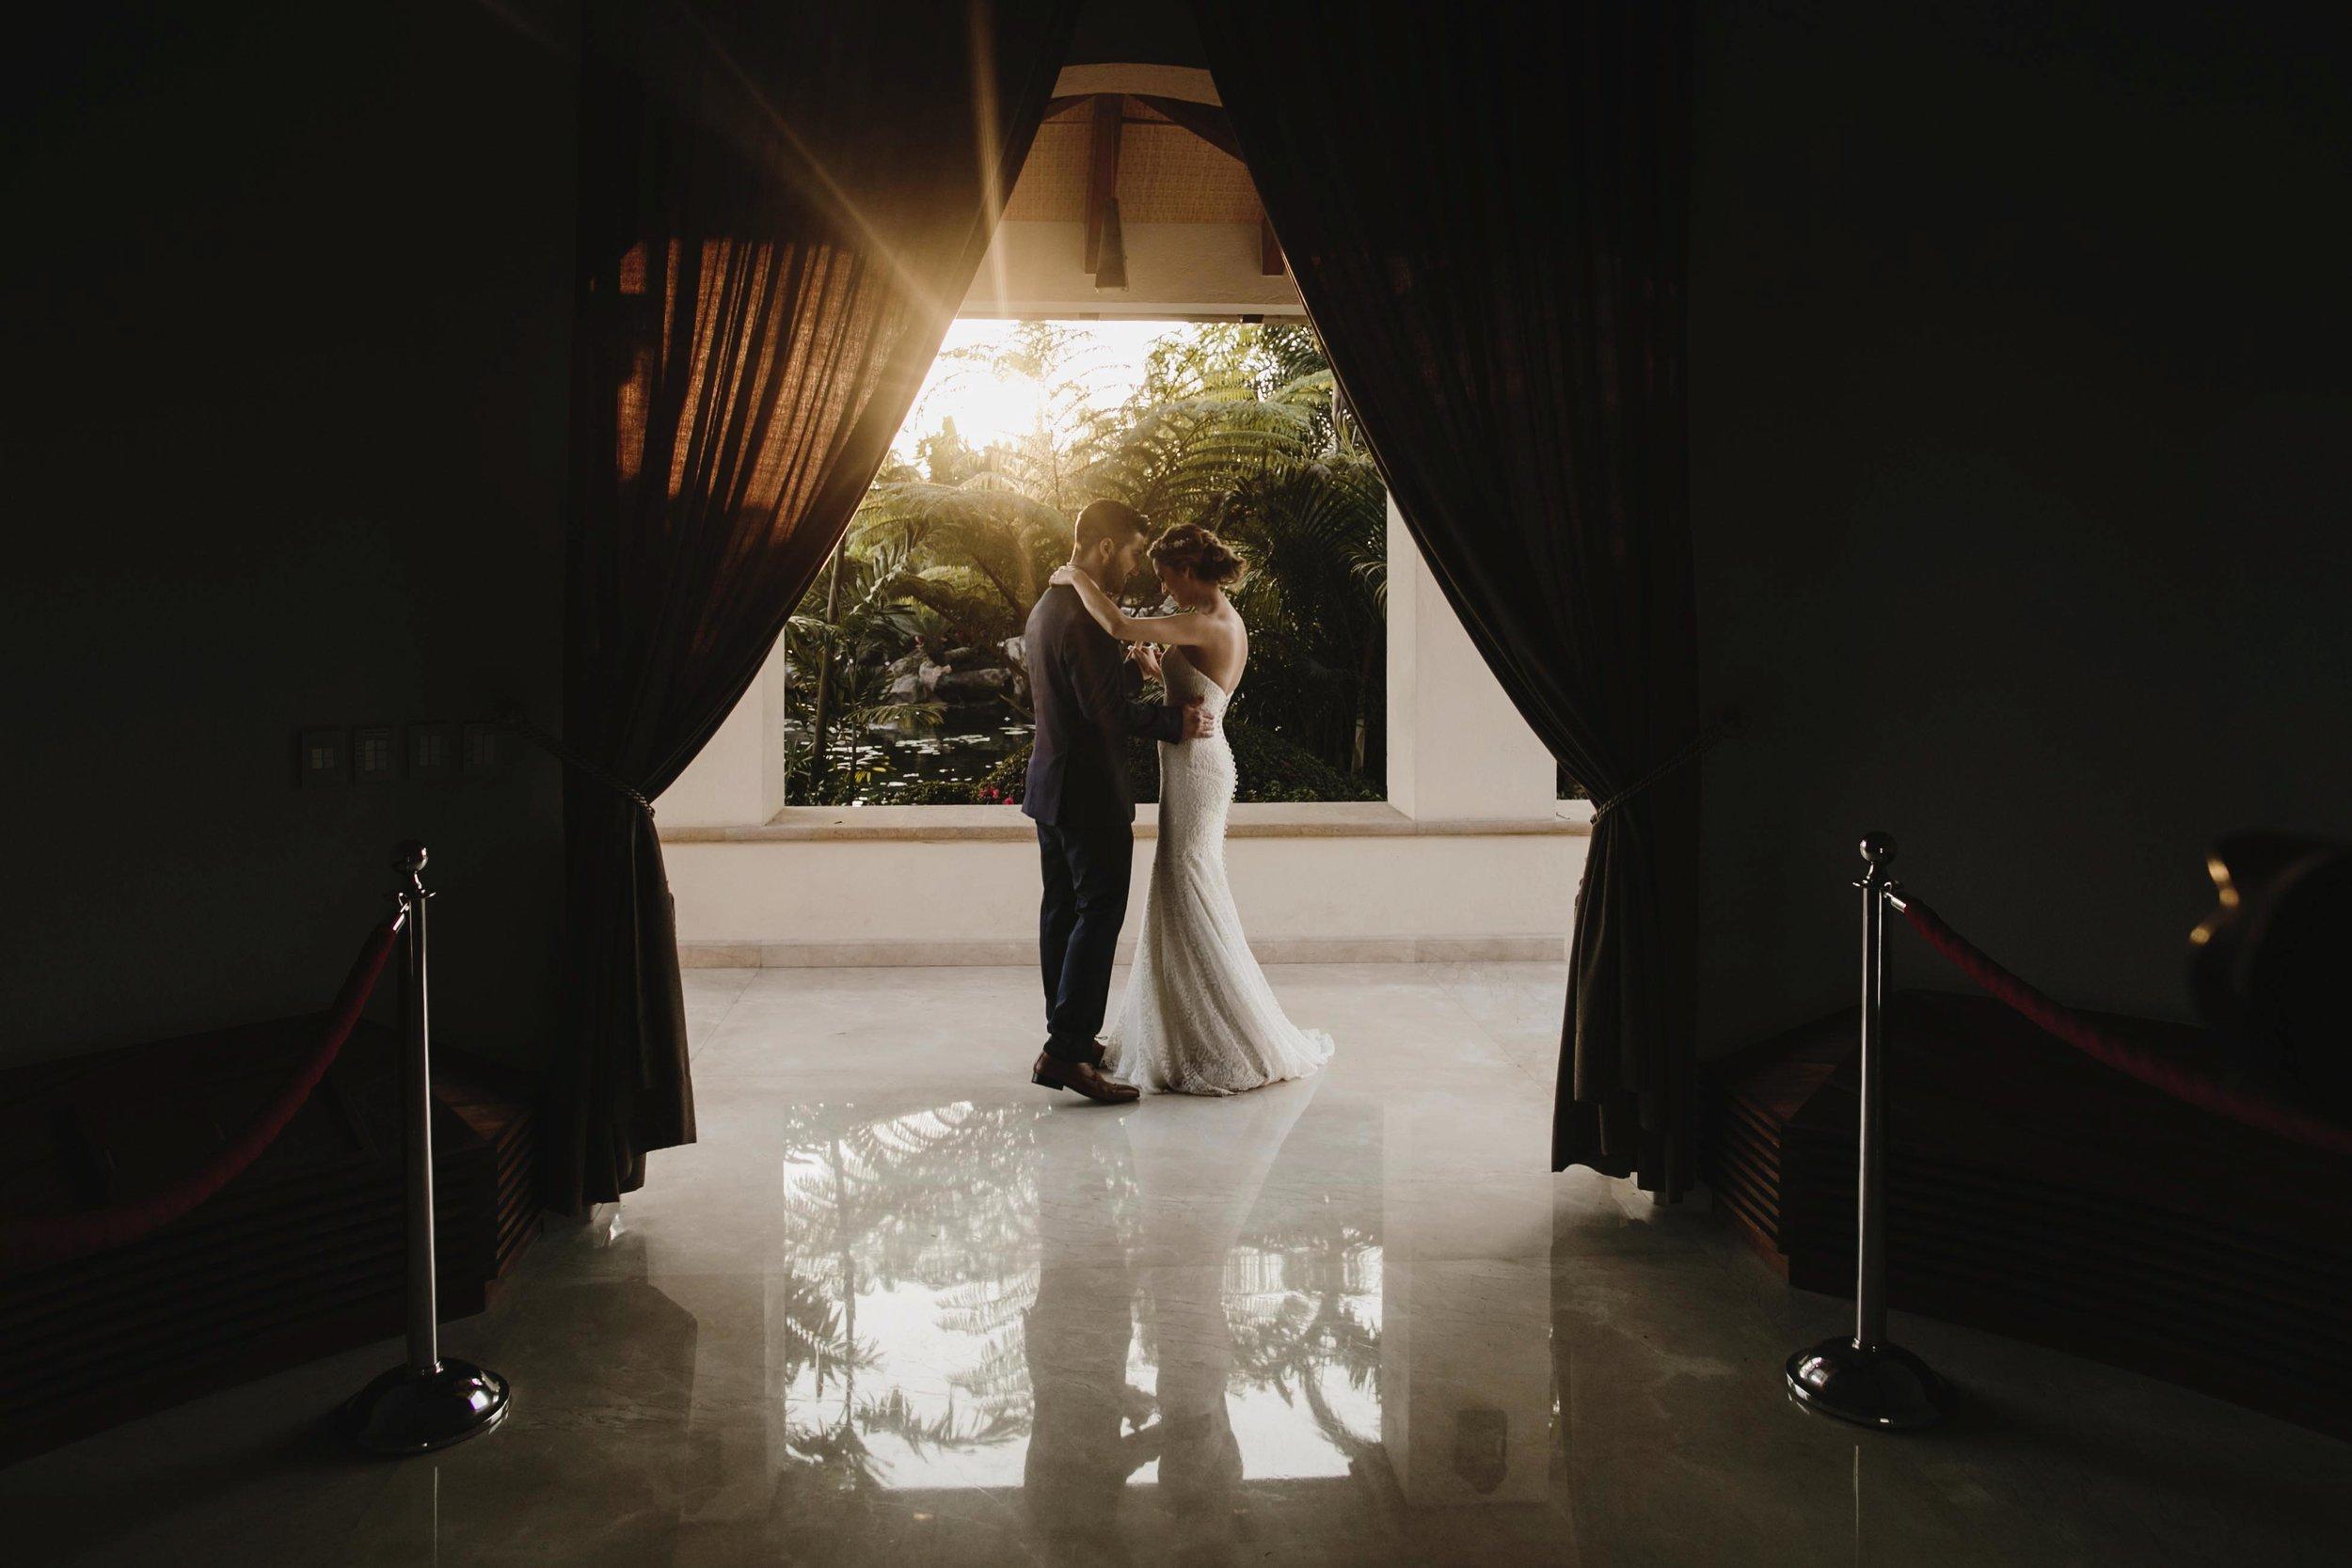 alfonso_flores_destination_wedding_photography_jardin_amarello_cuernavaca58.jpg